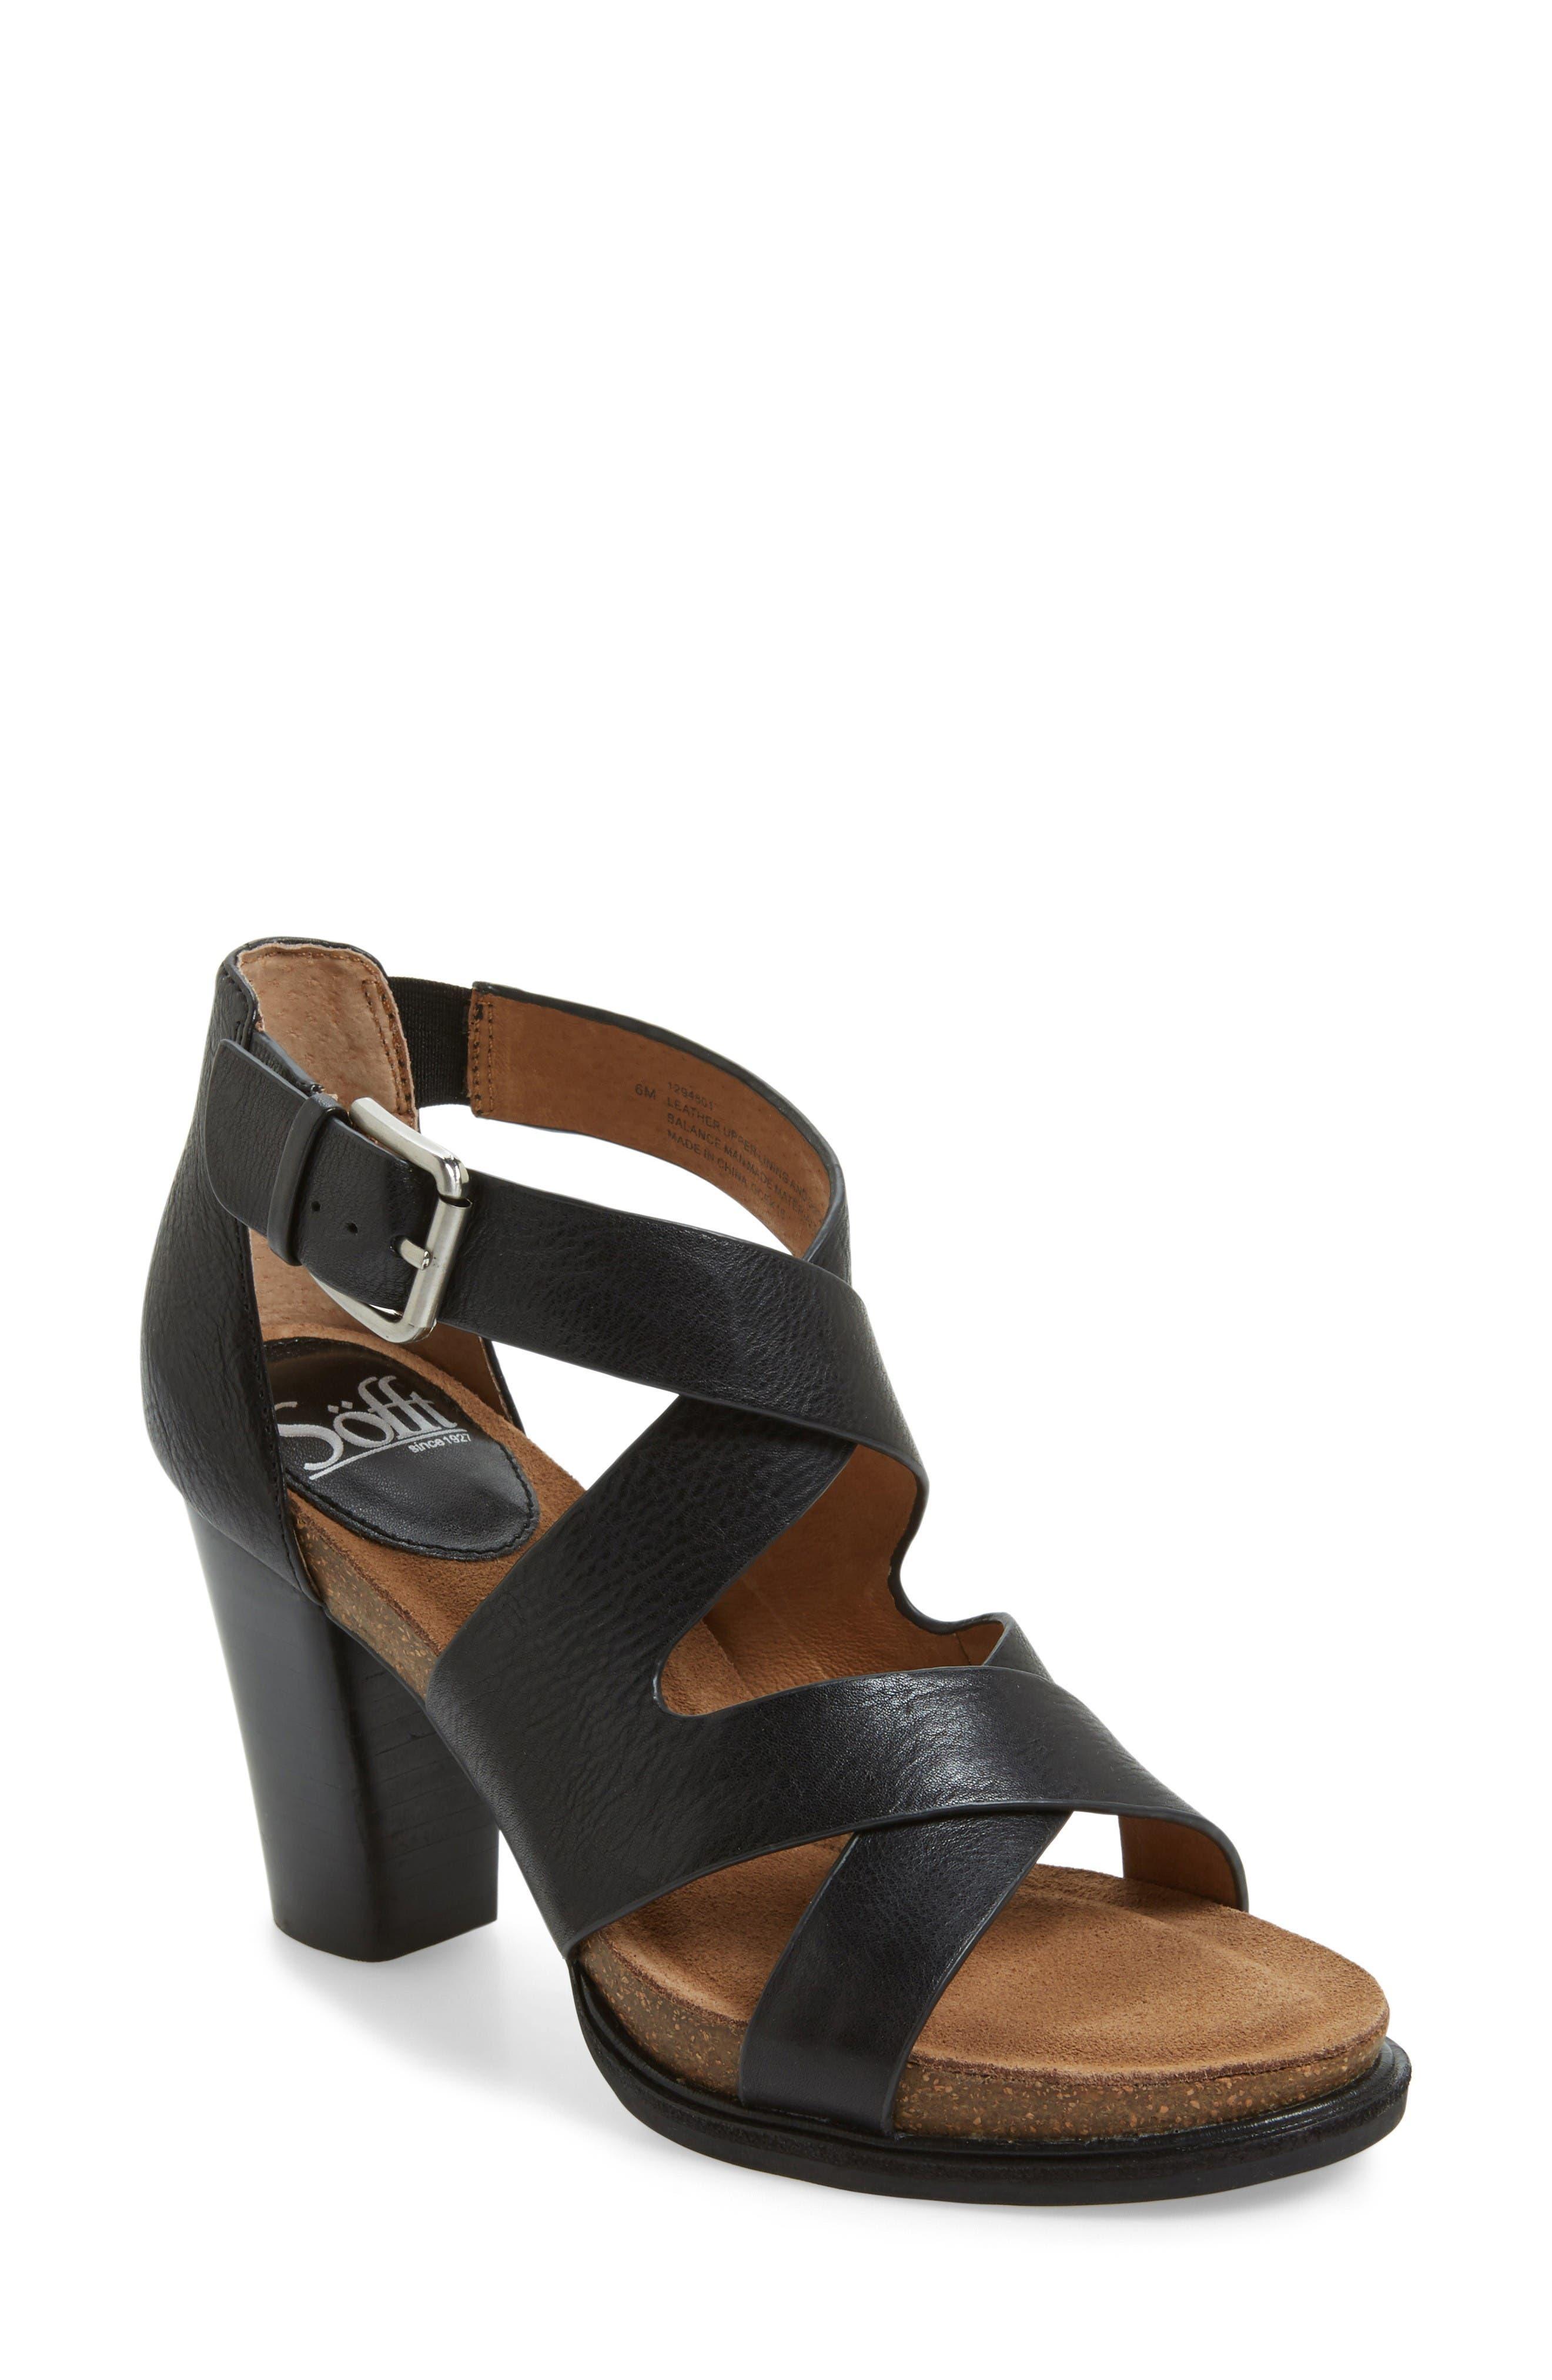 Main Image - Söfft Canita Block Heel Sandal (Women)